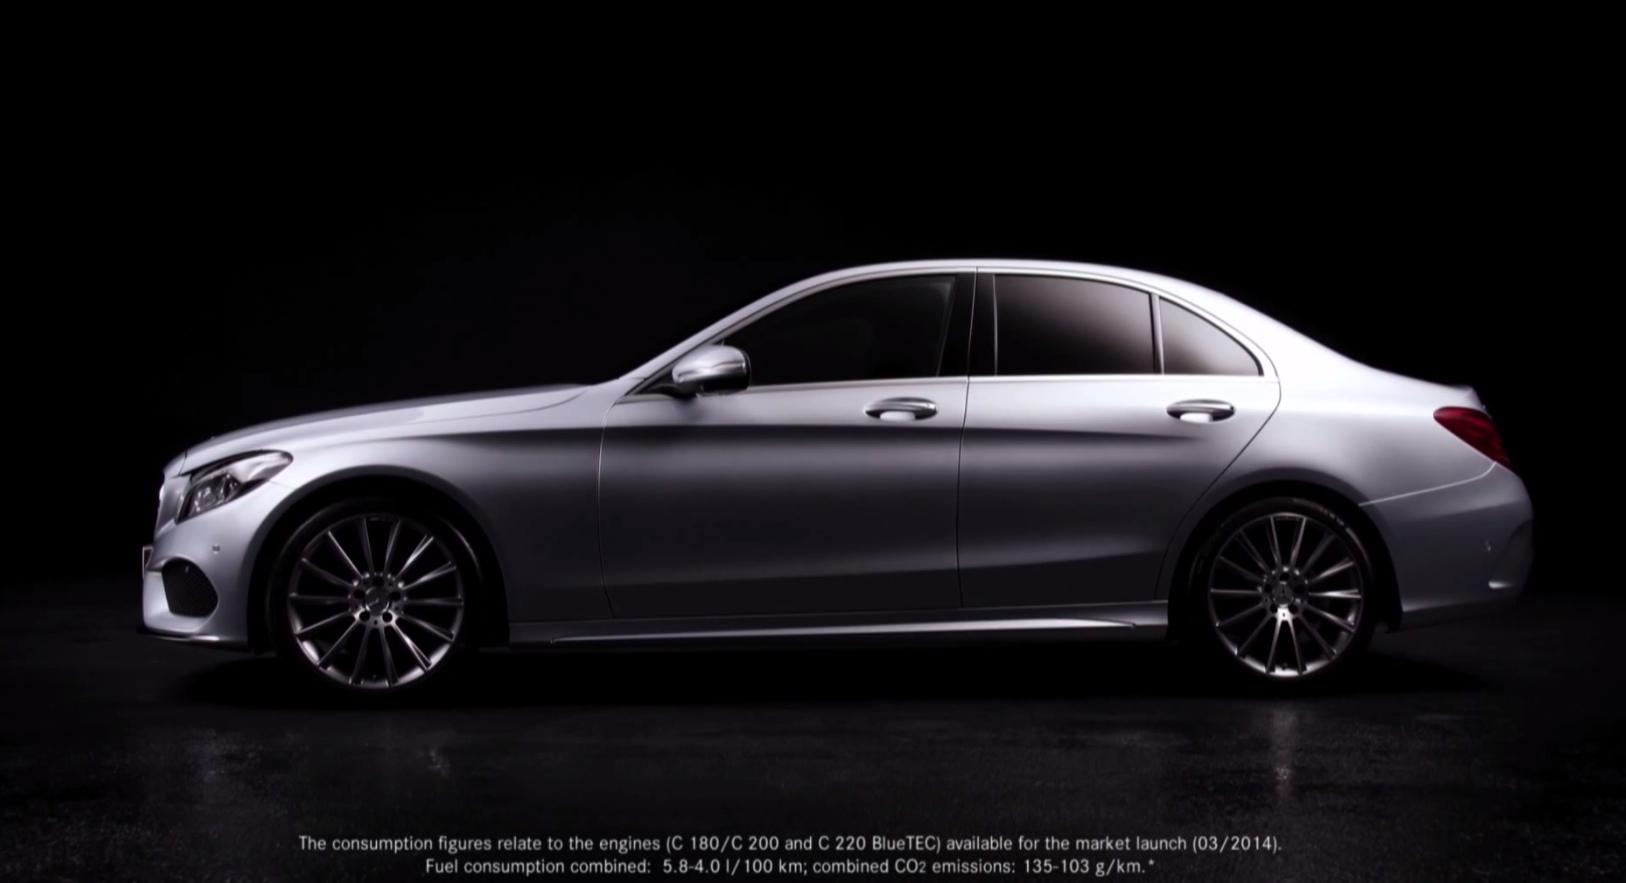 Mercedes benz explains the c class w205 design autoevolution for Mercedes benz w205